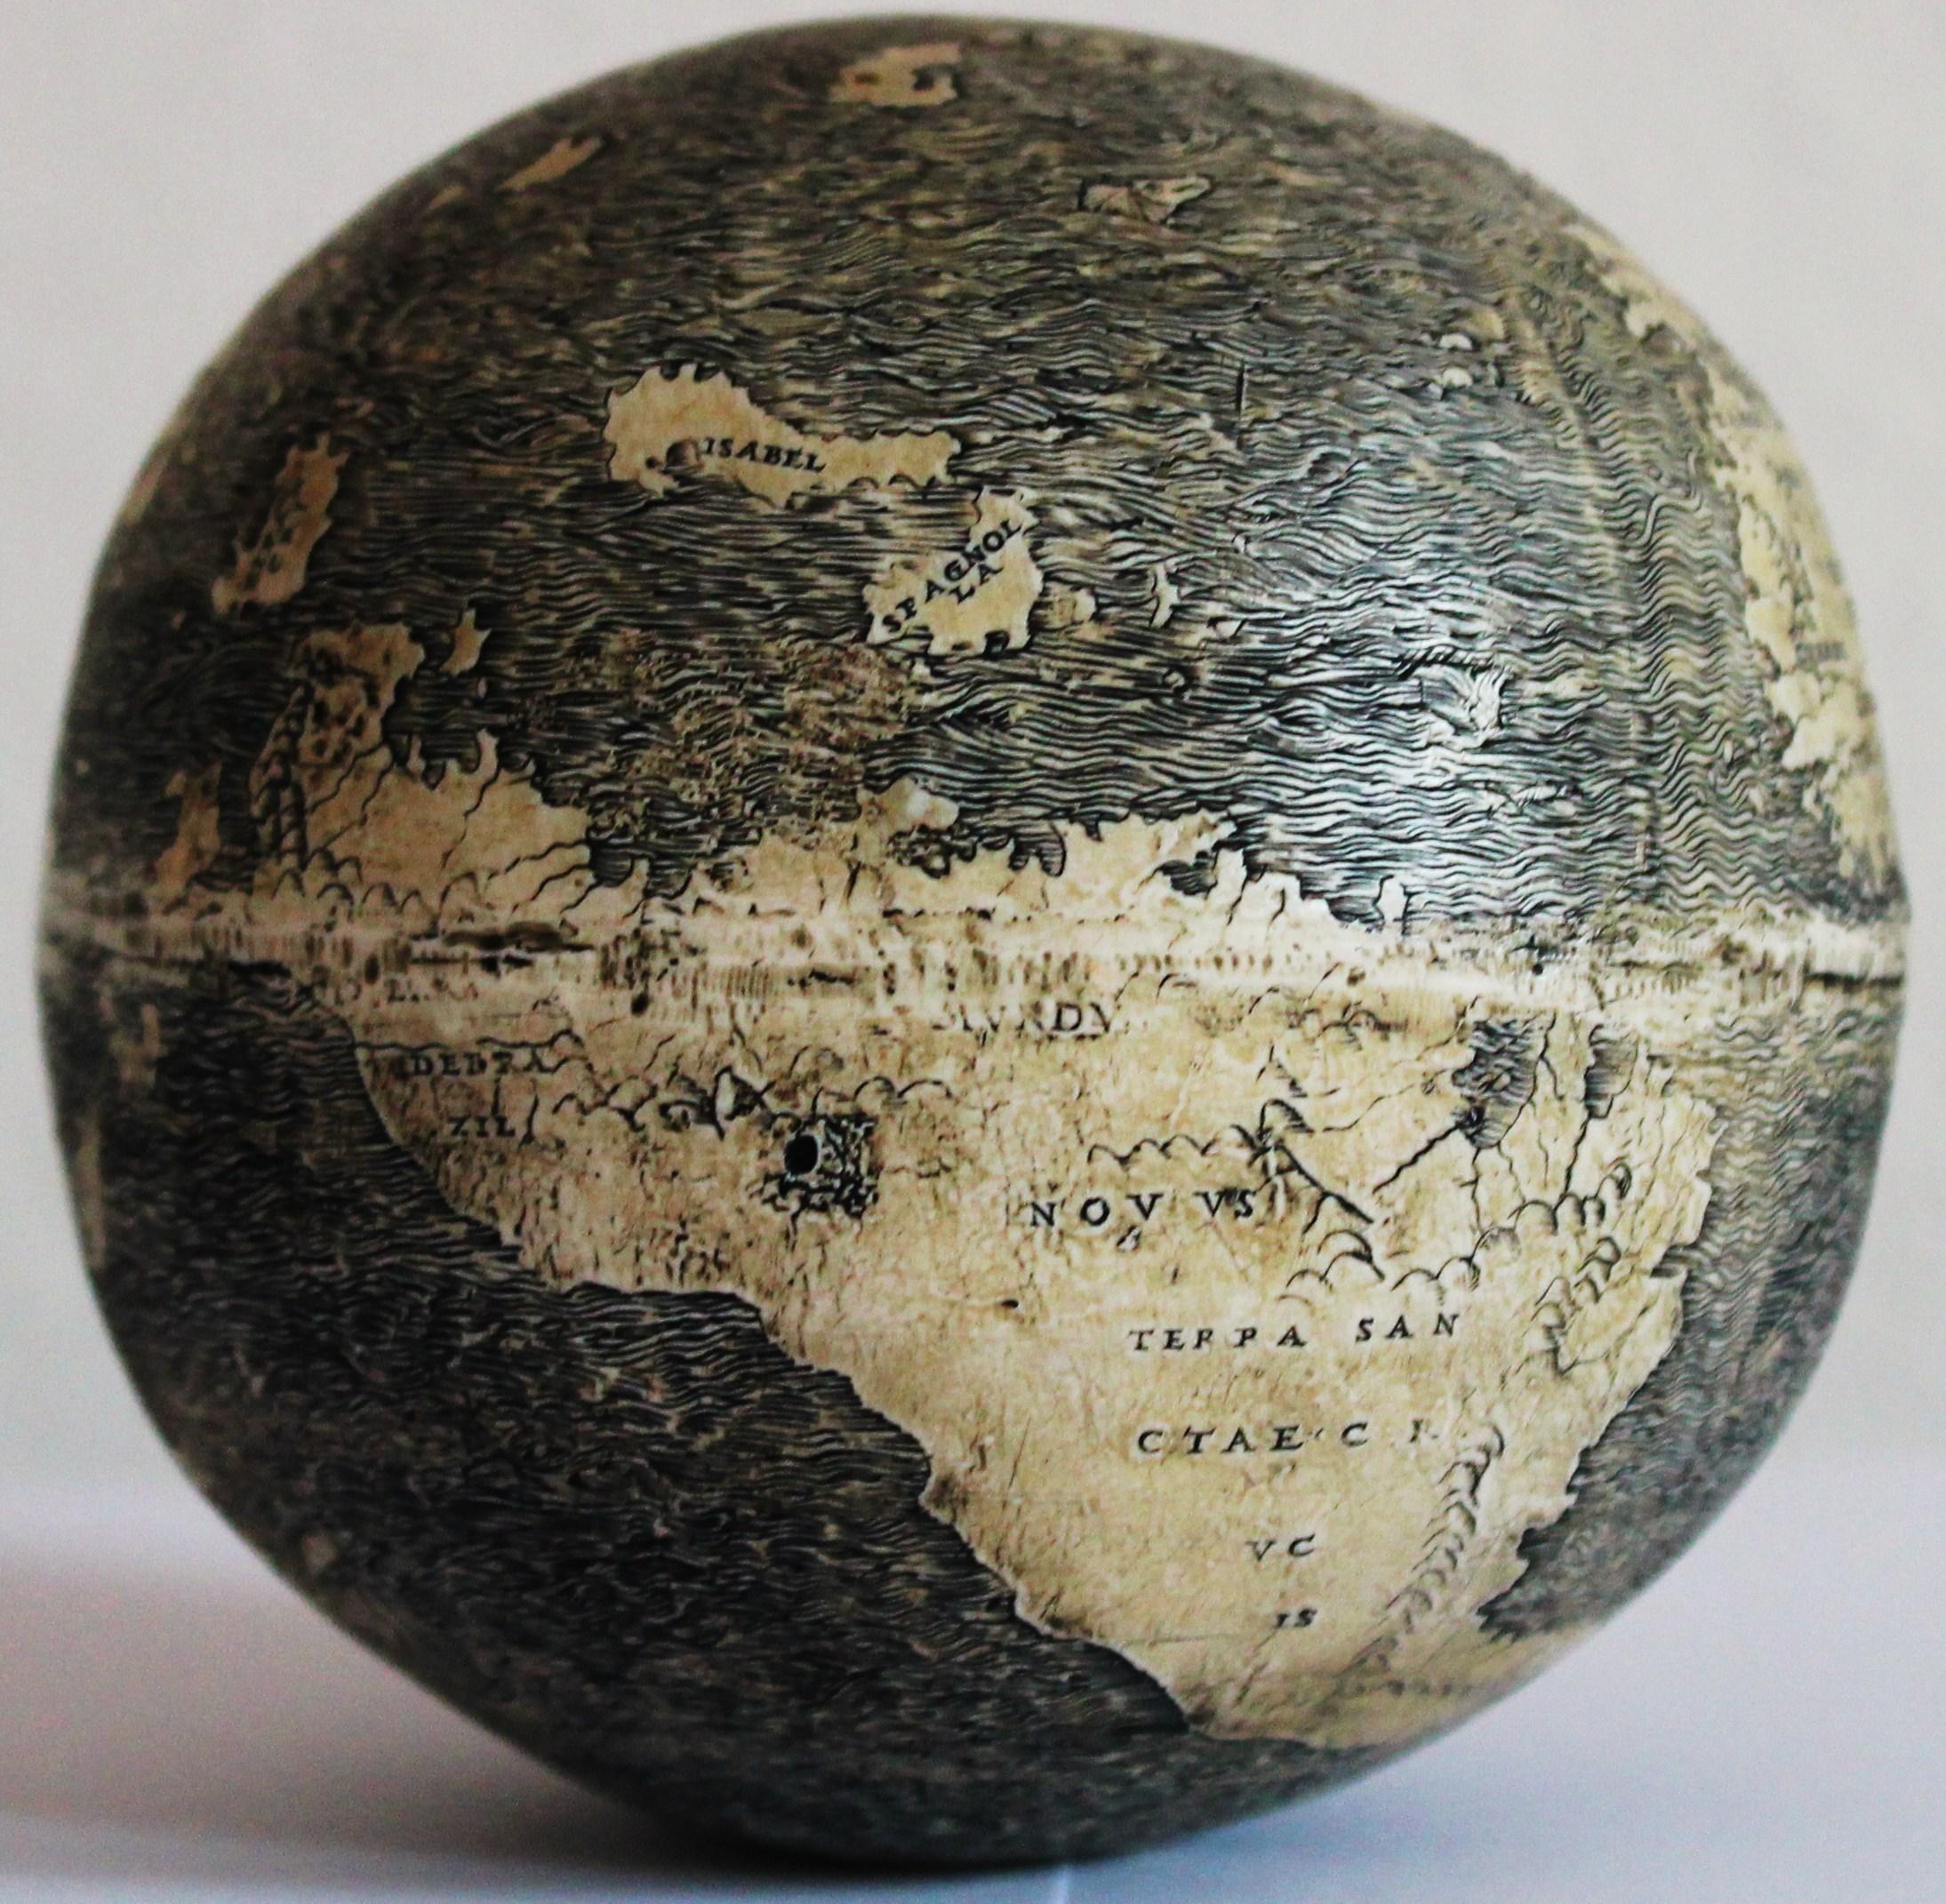 Фото старого глобуса 6